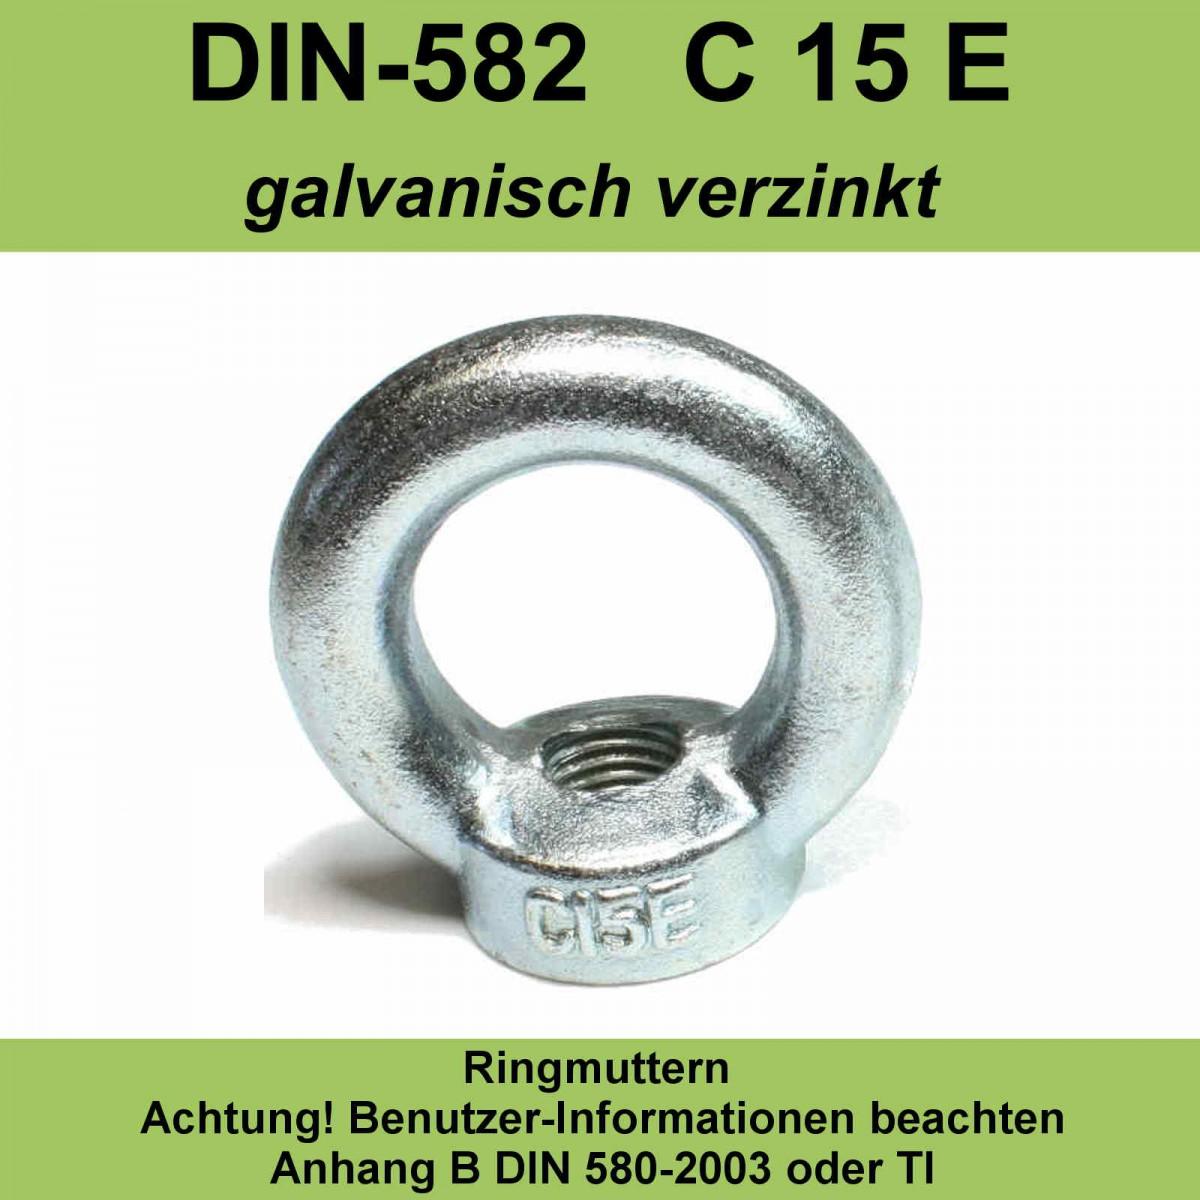 5x Ringmutter M8 DIN582 Galvanisch verzinkt Augenmutter Öse Transportöse NEU!!!!